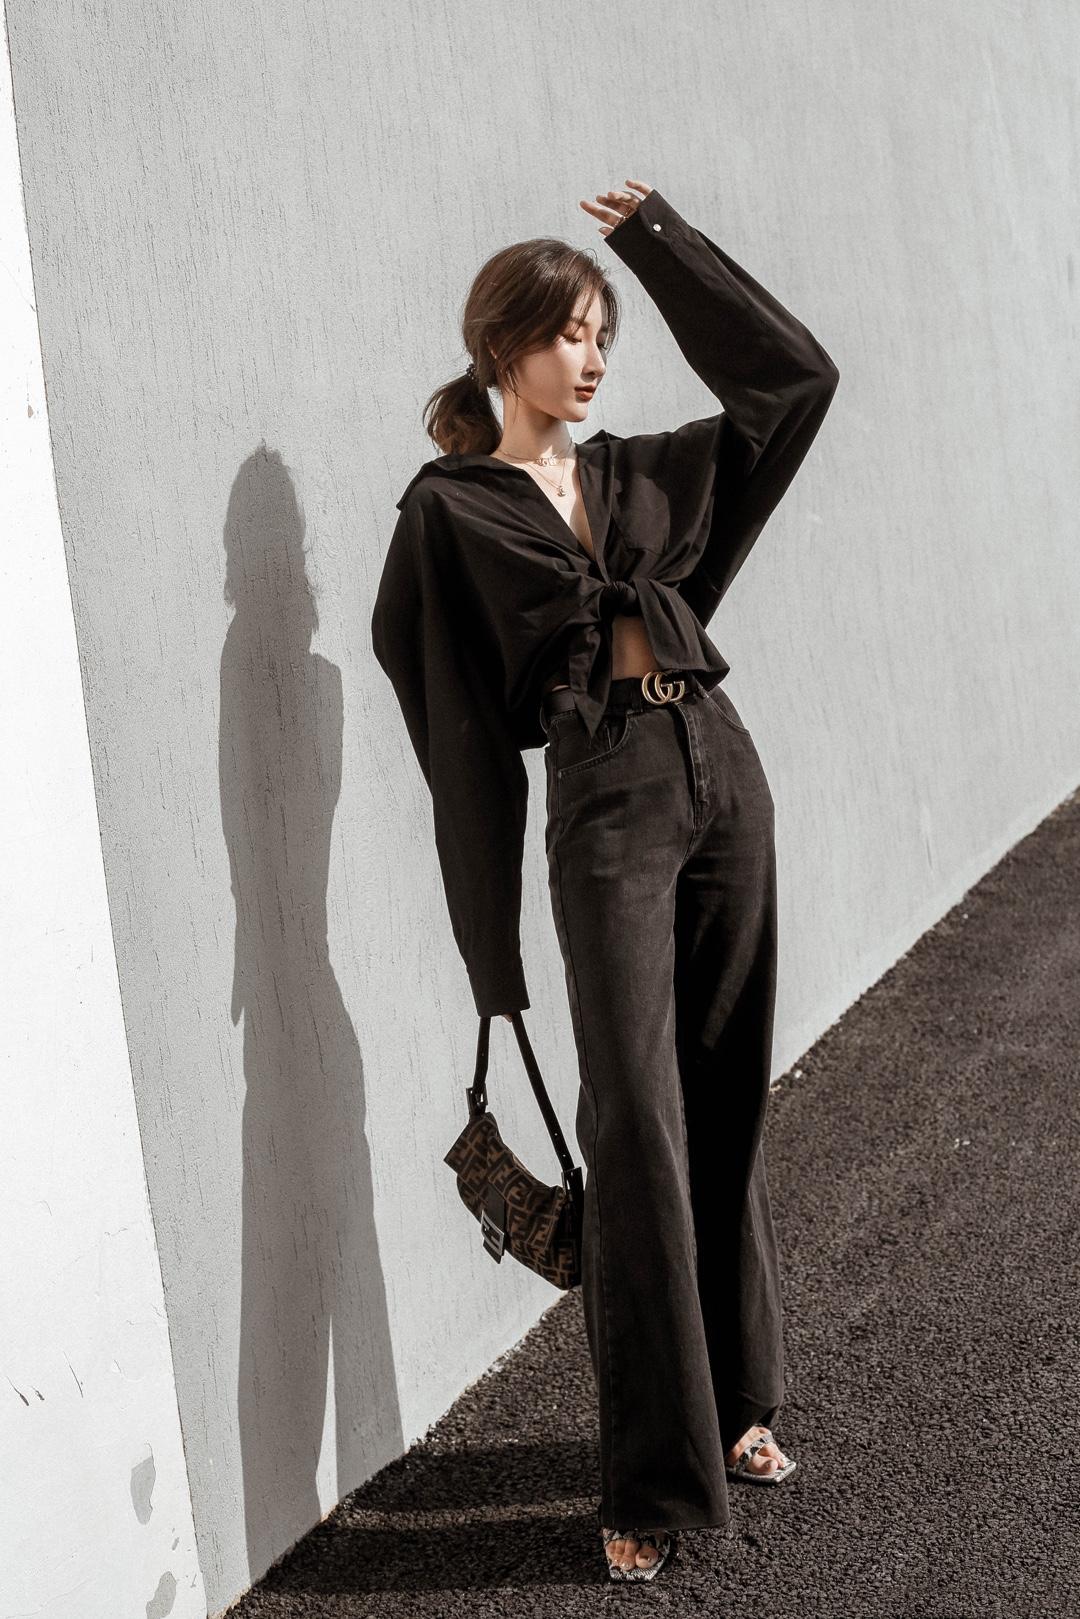 All Black 🖤🖤🖤 . 越来越明白剪裁、细节、面料的重要性 同样是基础款 好的剪裁、面料是提升整体气质跟气场的关键 就算全黑也不会沉闷 细节设计让整体不单调 再加浅金配饰点亮 OOTD: 衬衫:Jacquemus 裤子:The ragged priest 项链:Dior 腰带:Gucci 包包:Fendi 鞋子:Lost in echo #肉女孩别滑走!显瘦就这套!#